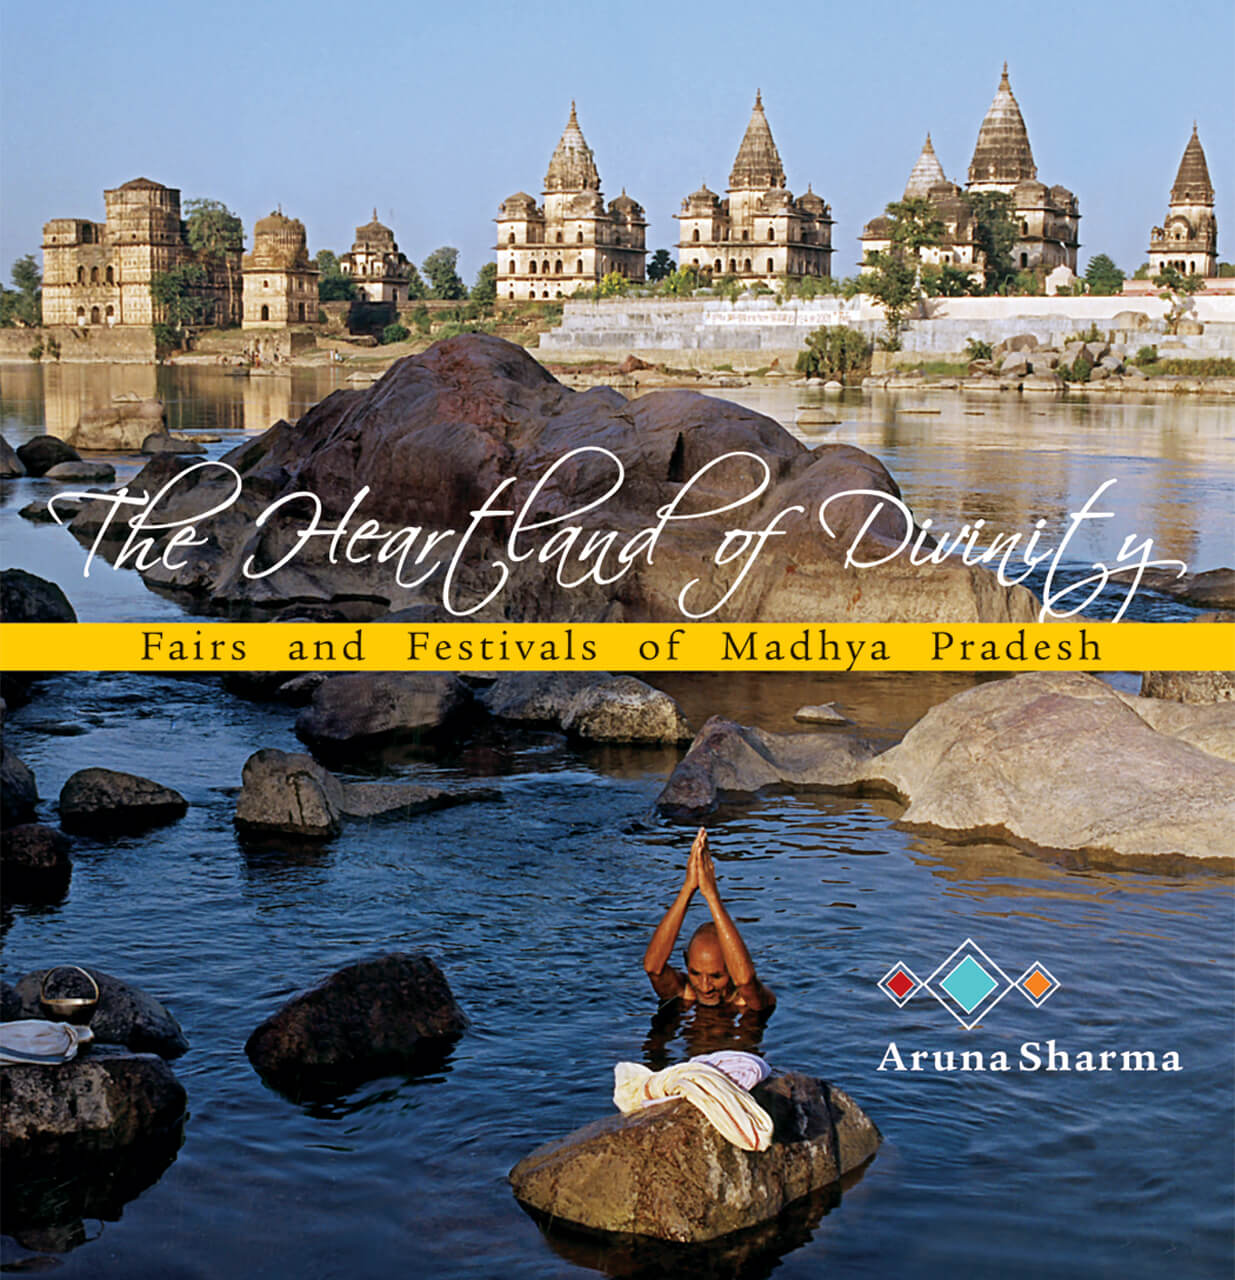 The Heartland Of Divinity: Fairs And Festivals Of Madhya Pradesh